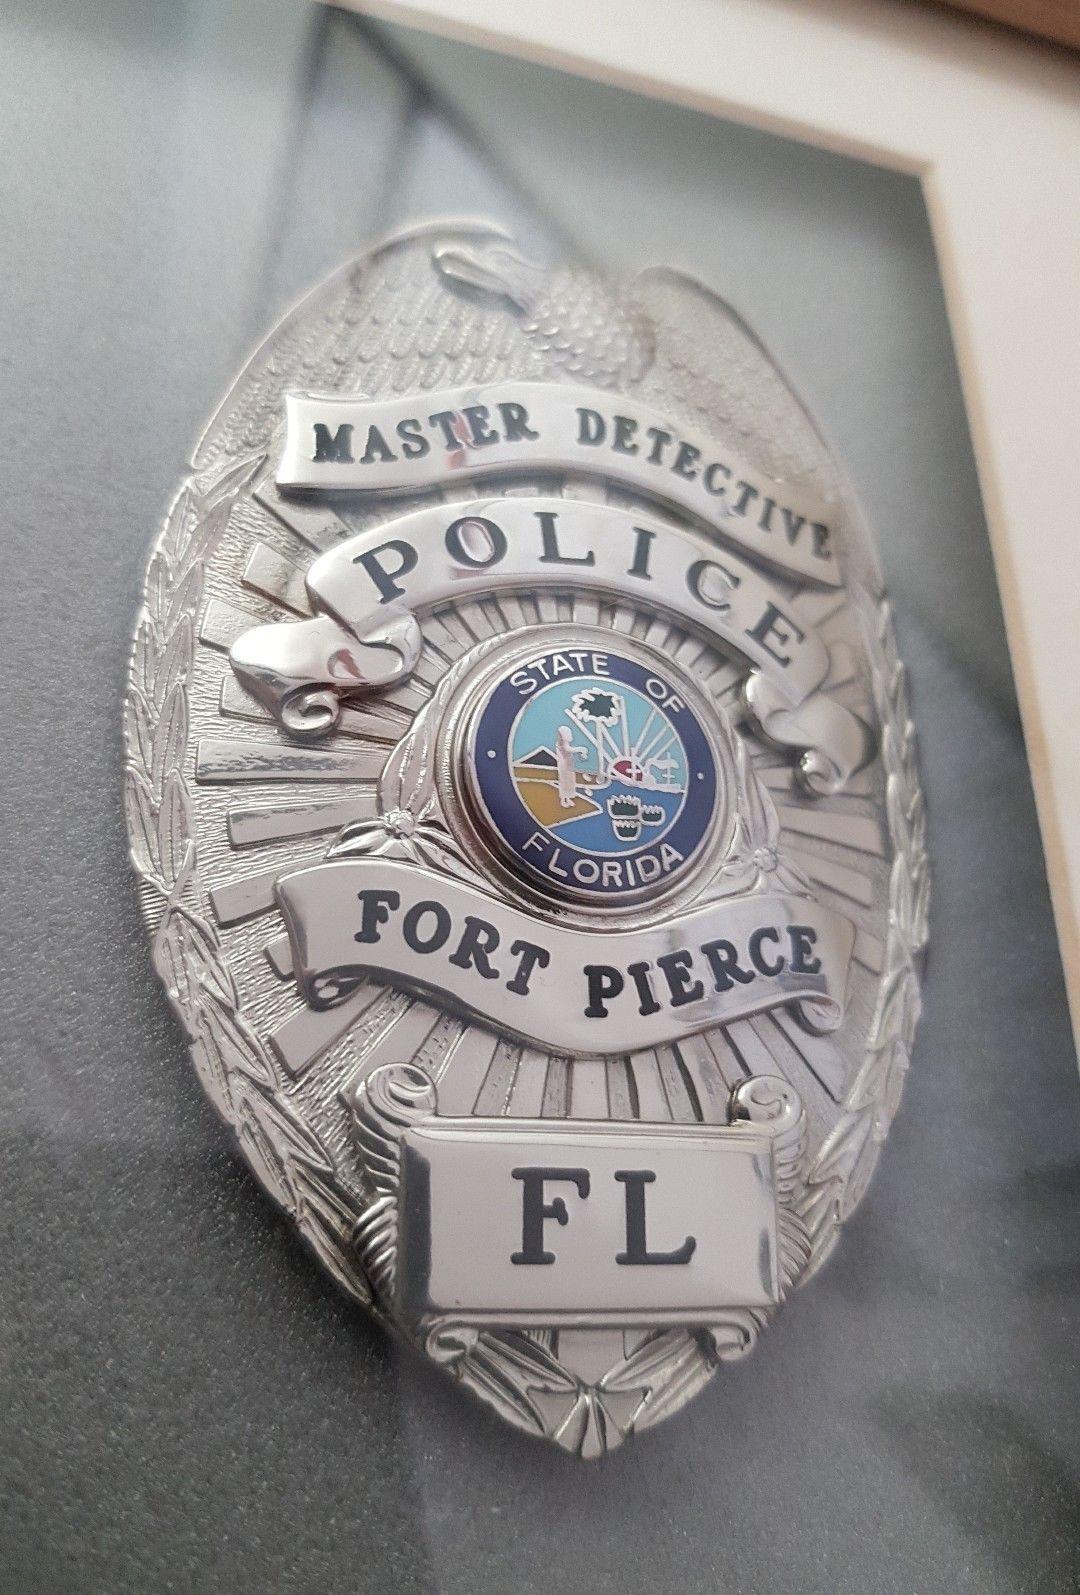 Master Detective, Fort Pierce Police, Florida Fire badge